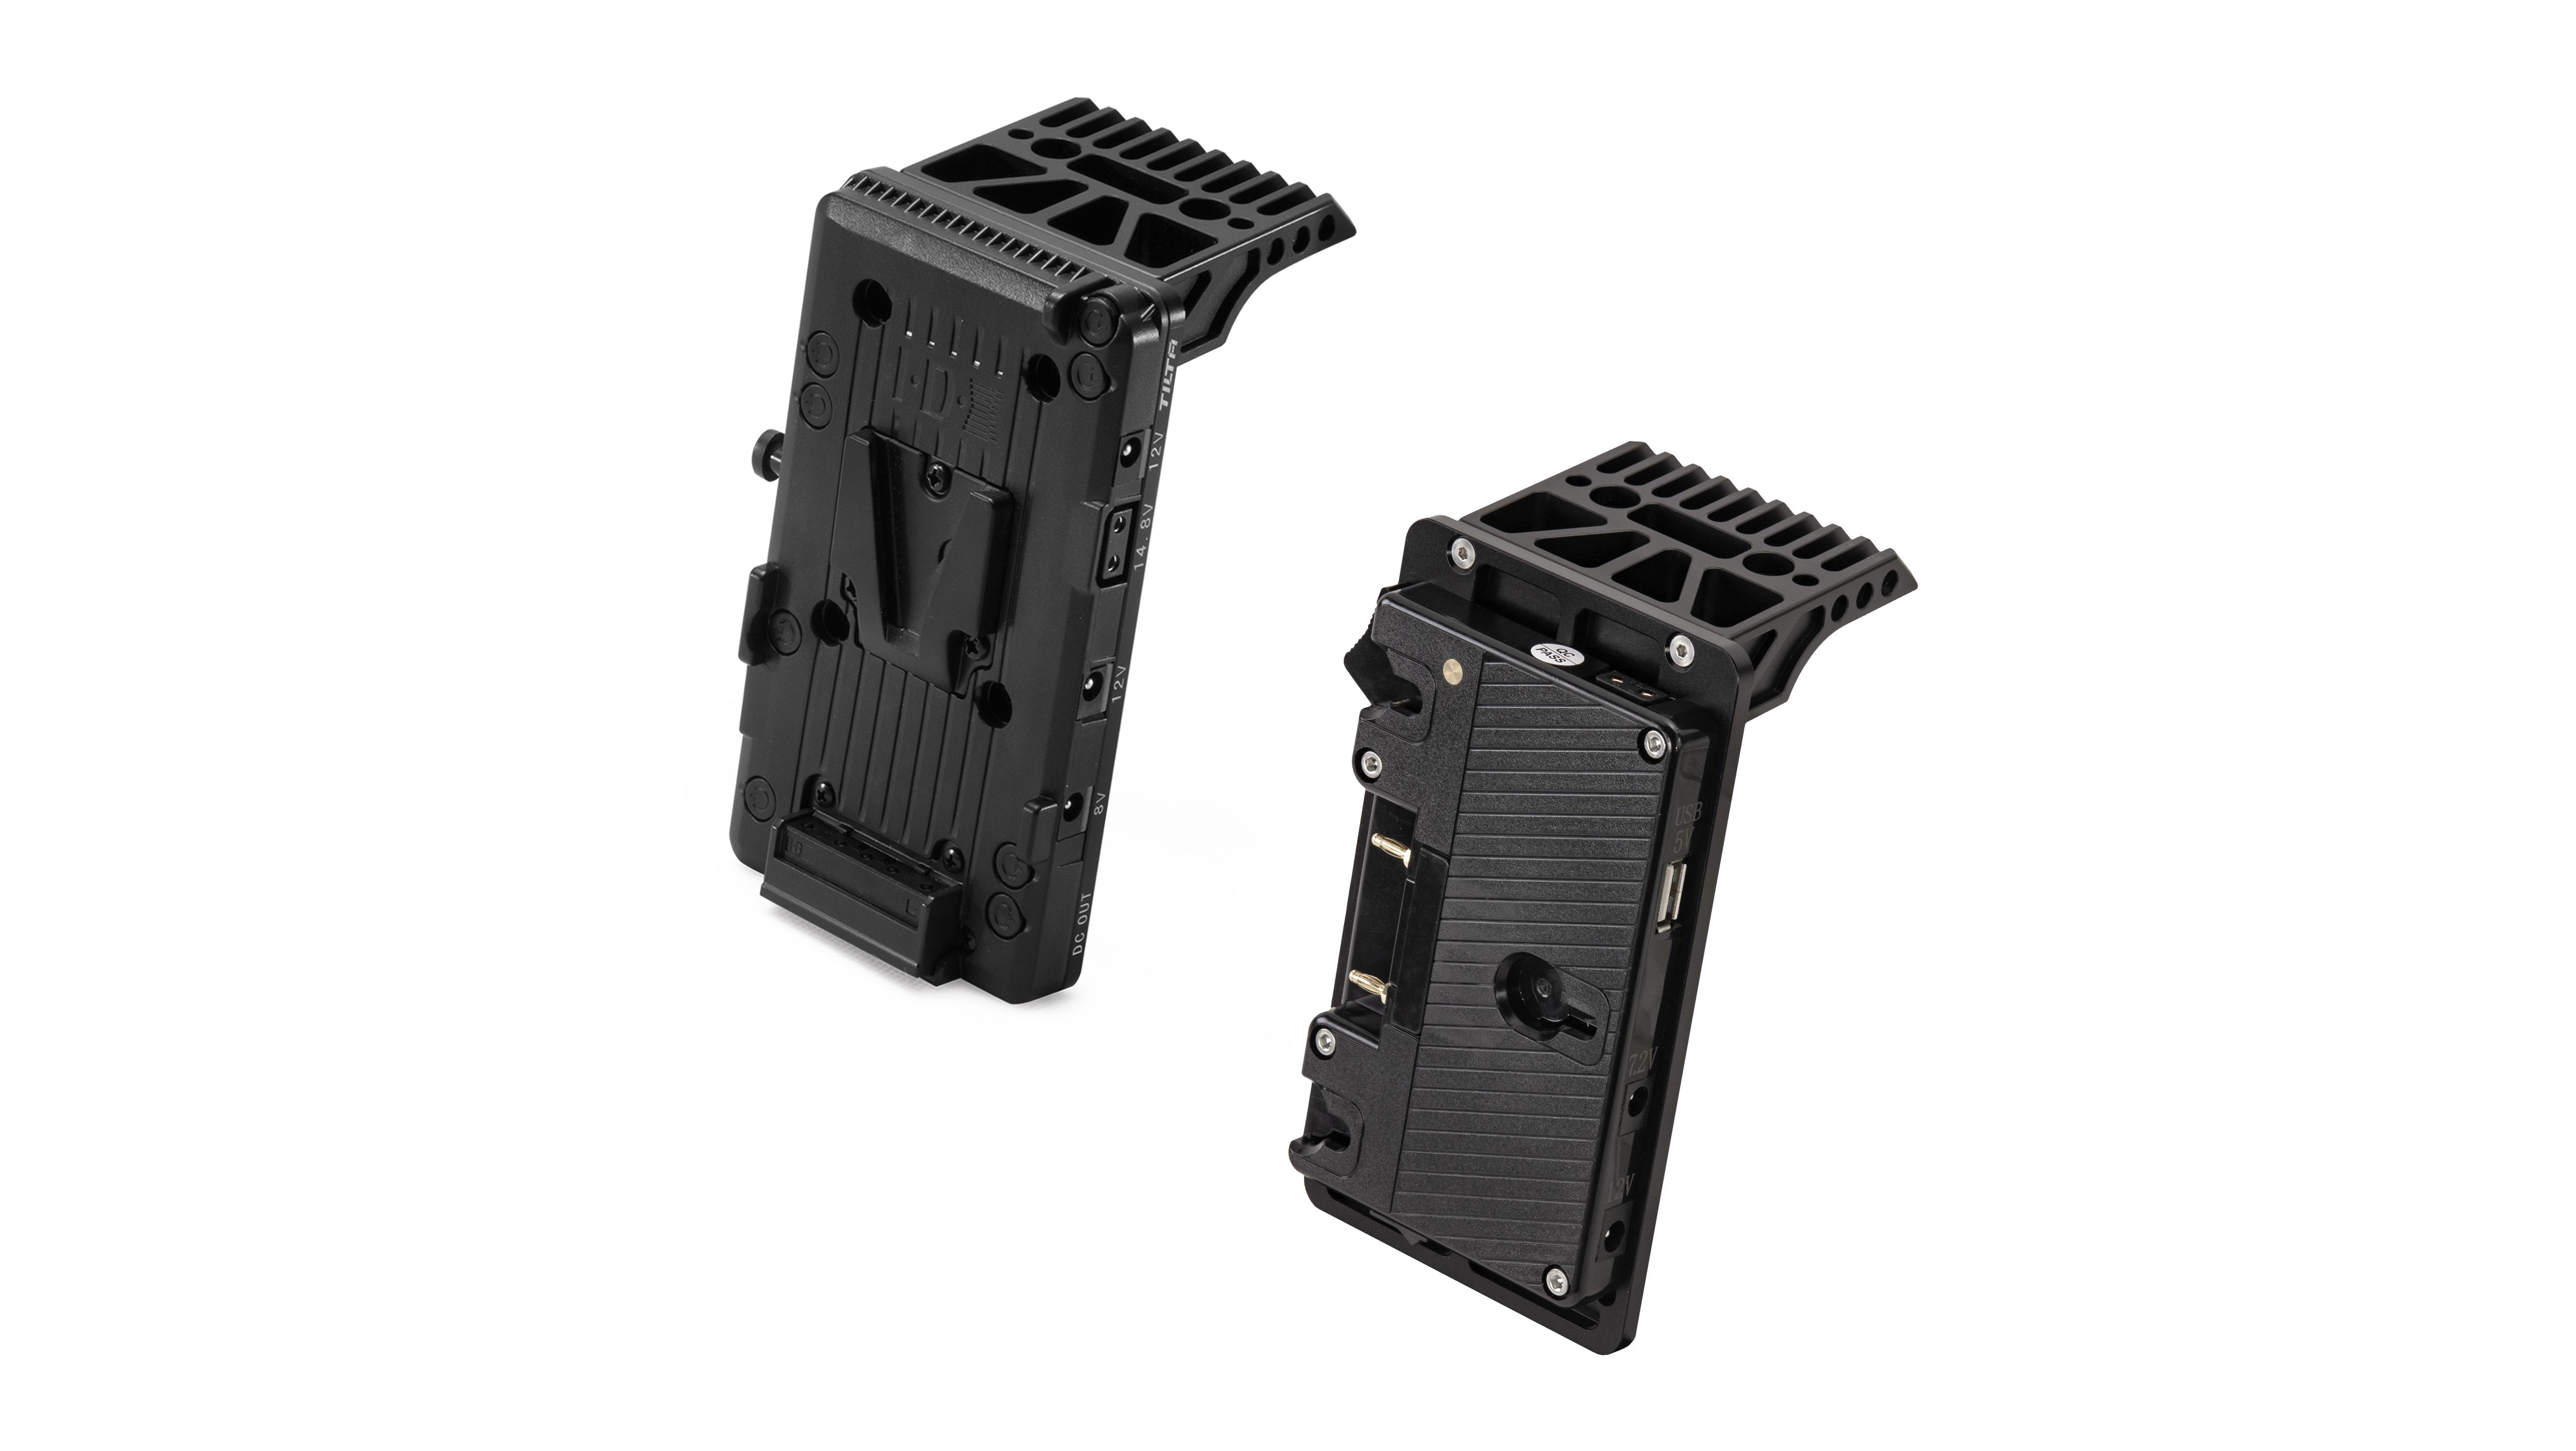 Battery Plate for Sony FS7 (Open Box)